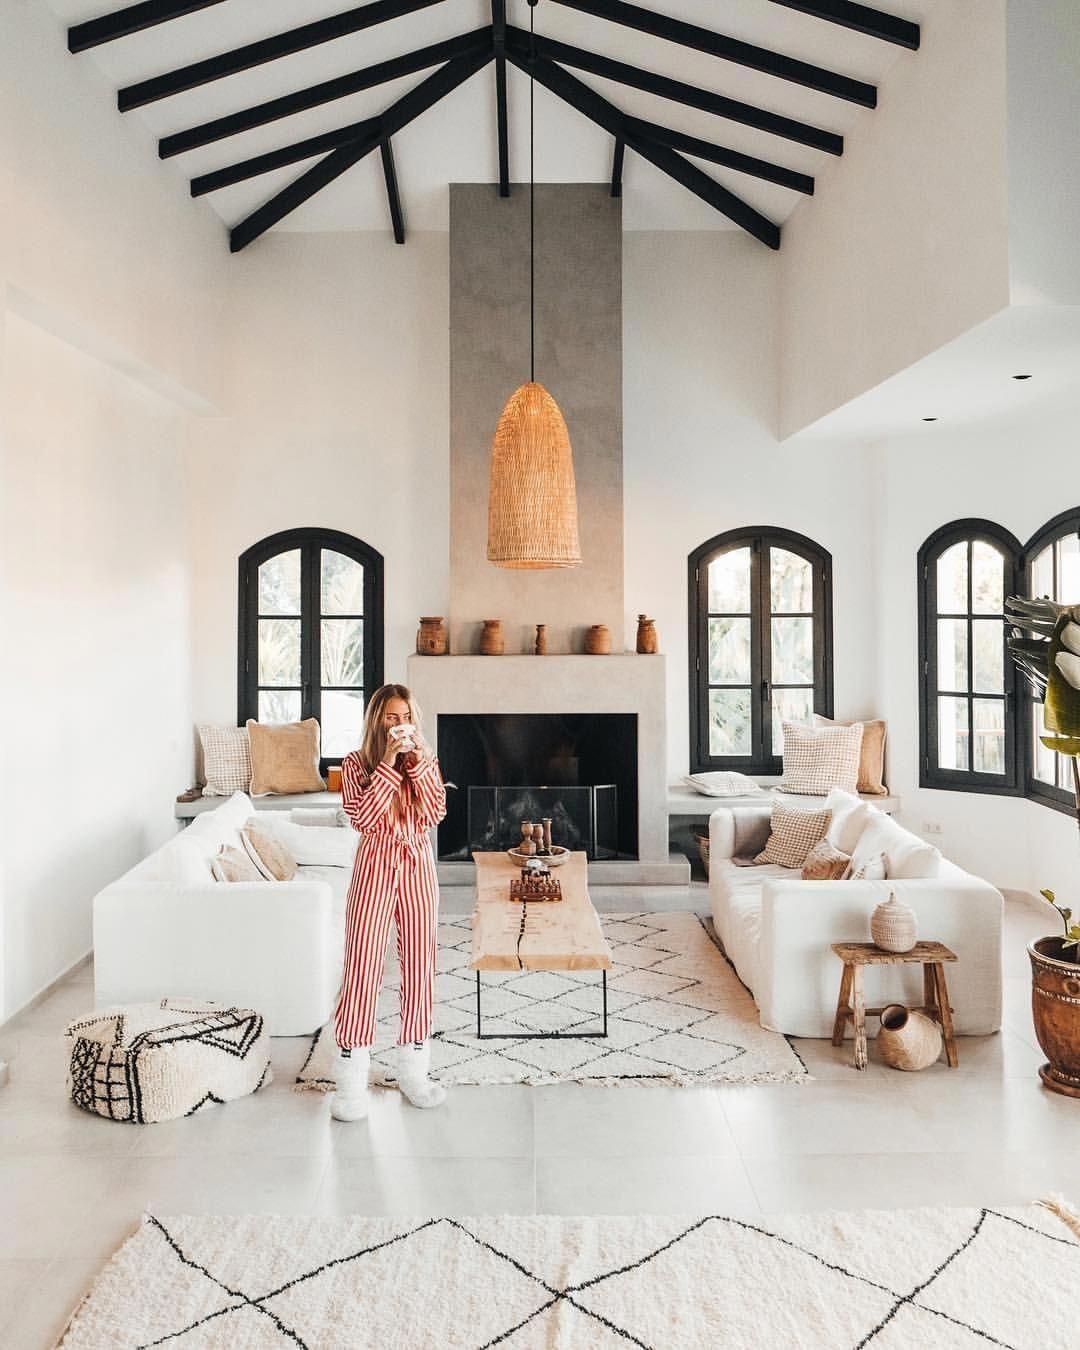 Receiving Room Interior Design: Idea, Secrets, Furthermore Resource In The Interest Of